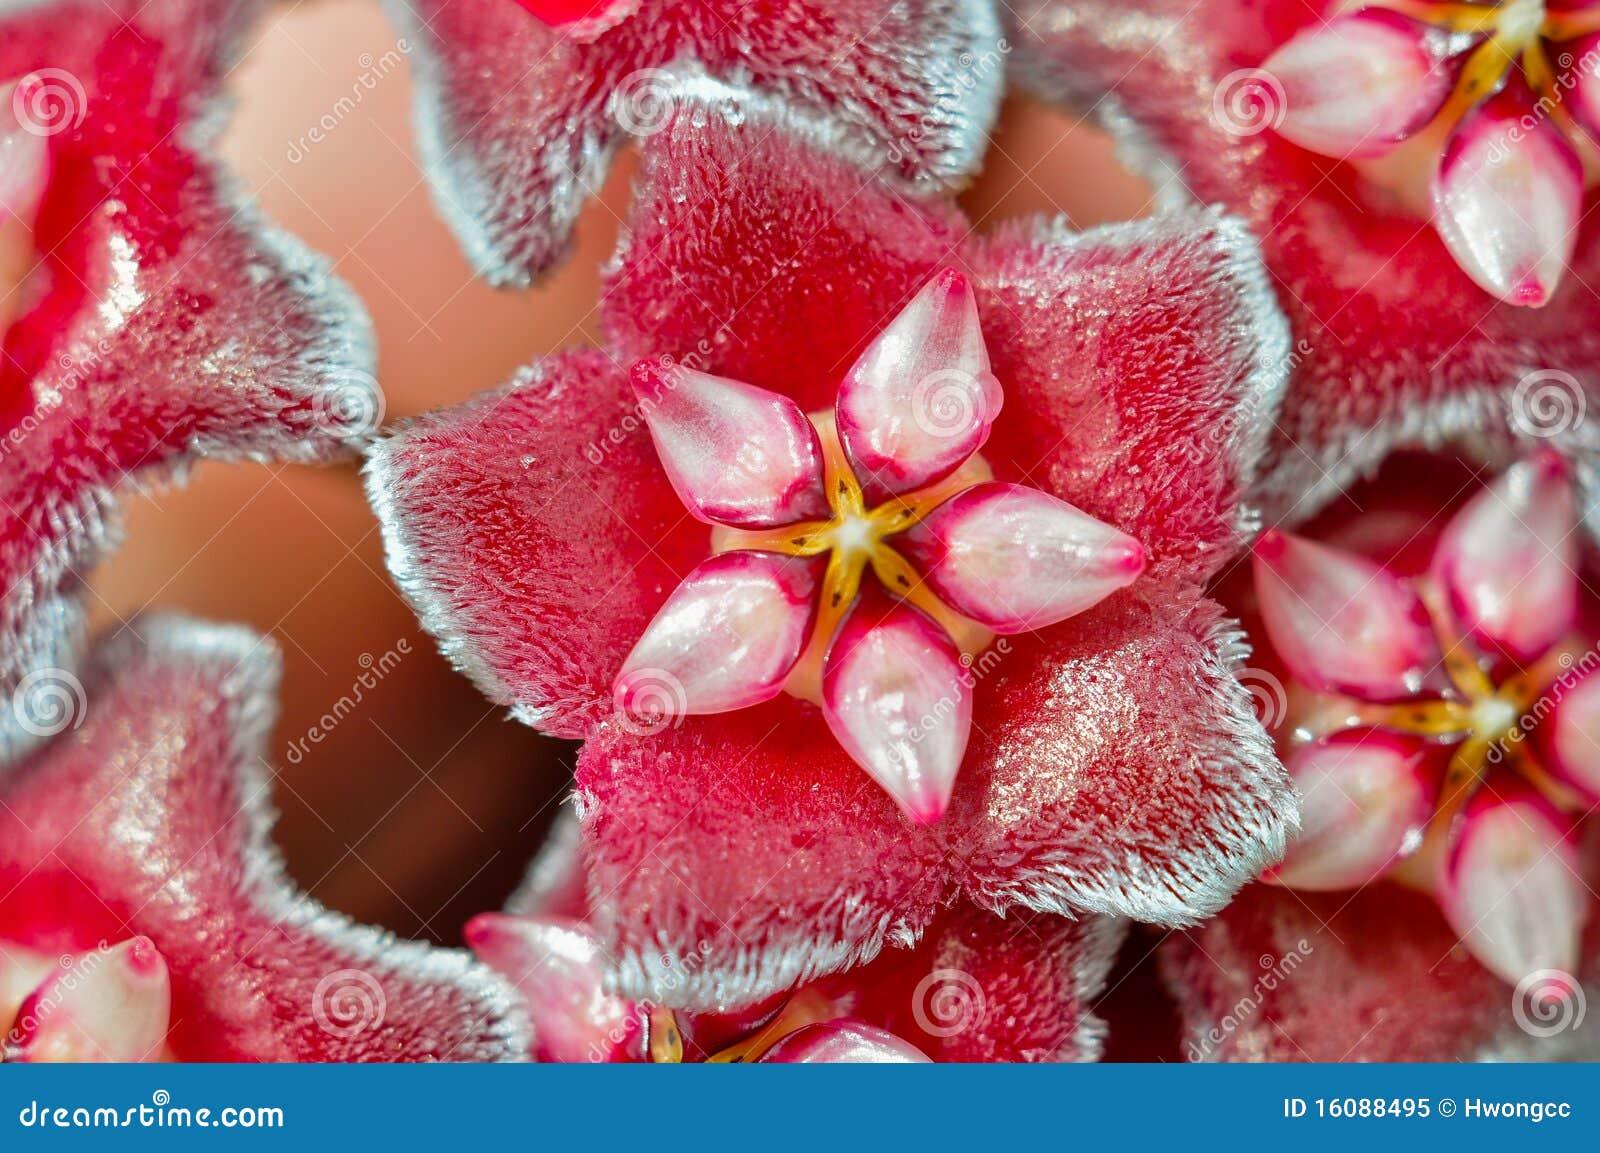 Hoya flowers (Hoya carnosa) macro